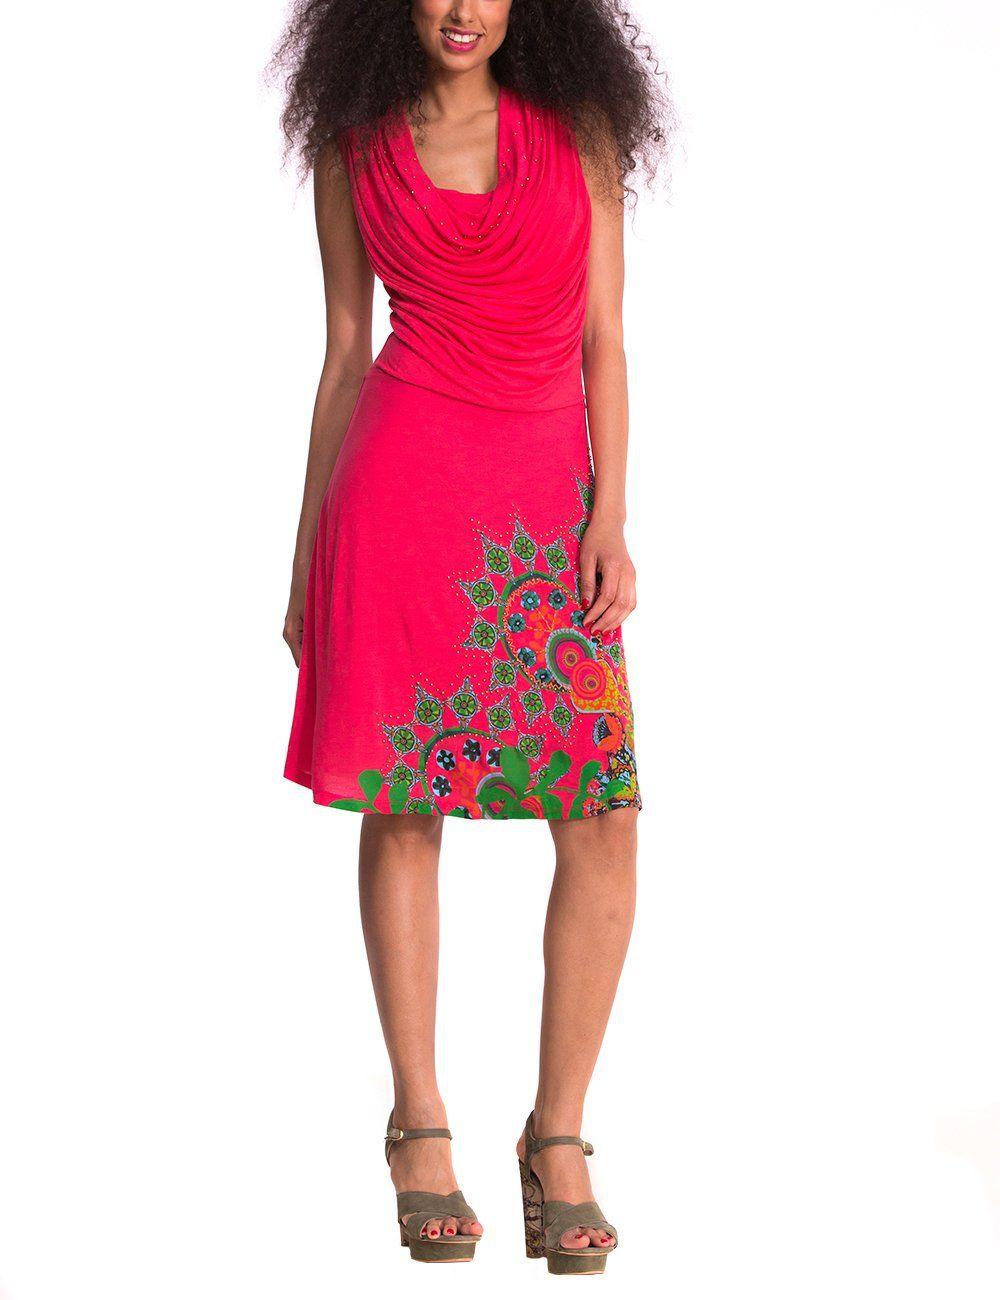 Desigual Babylee | Mano Desigual - 2 | Pinterest | Dress skirt ...